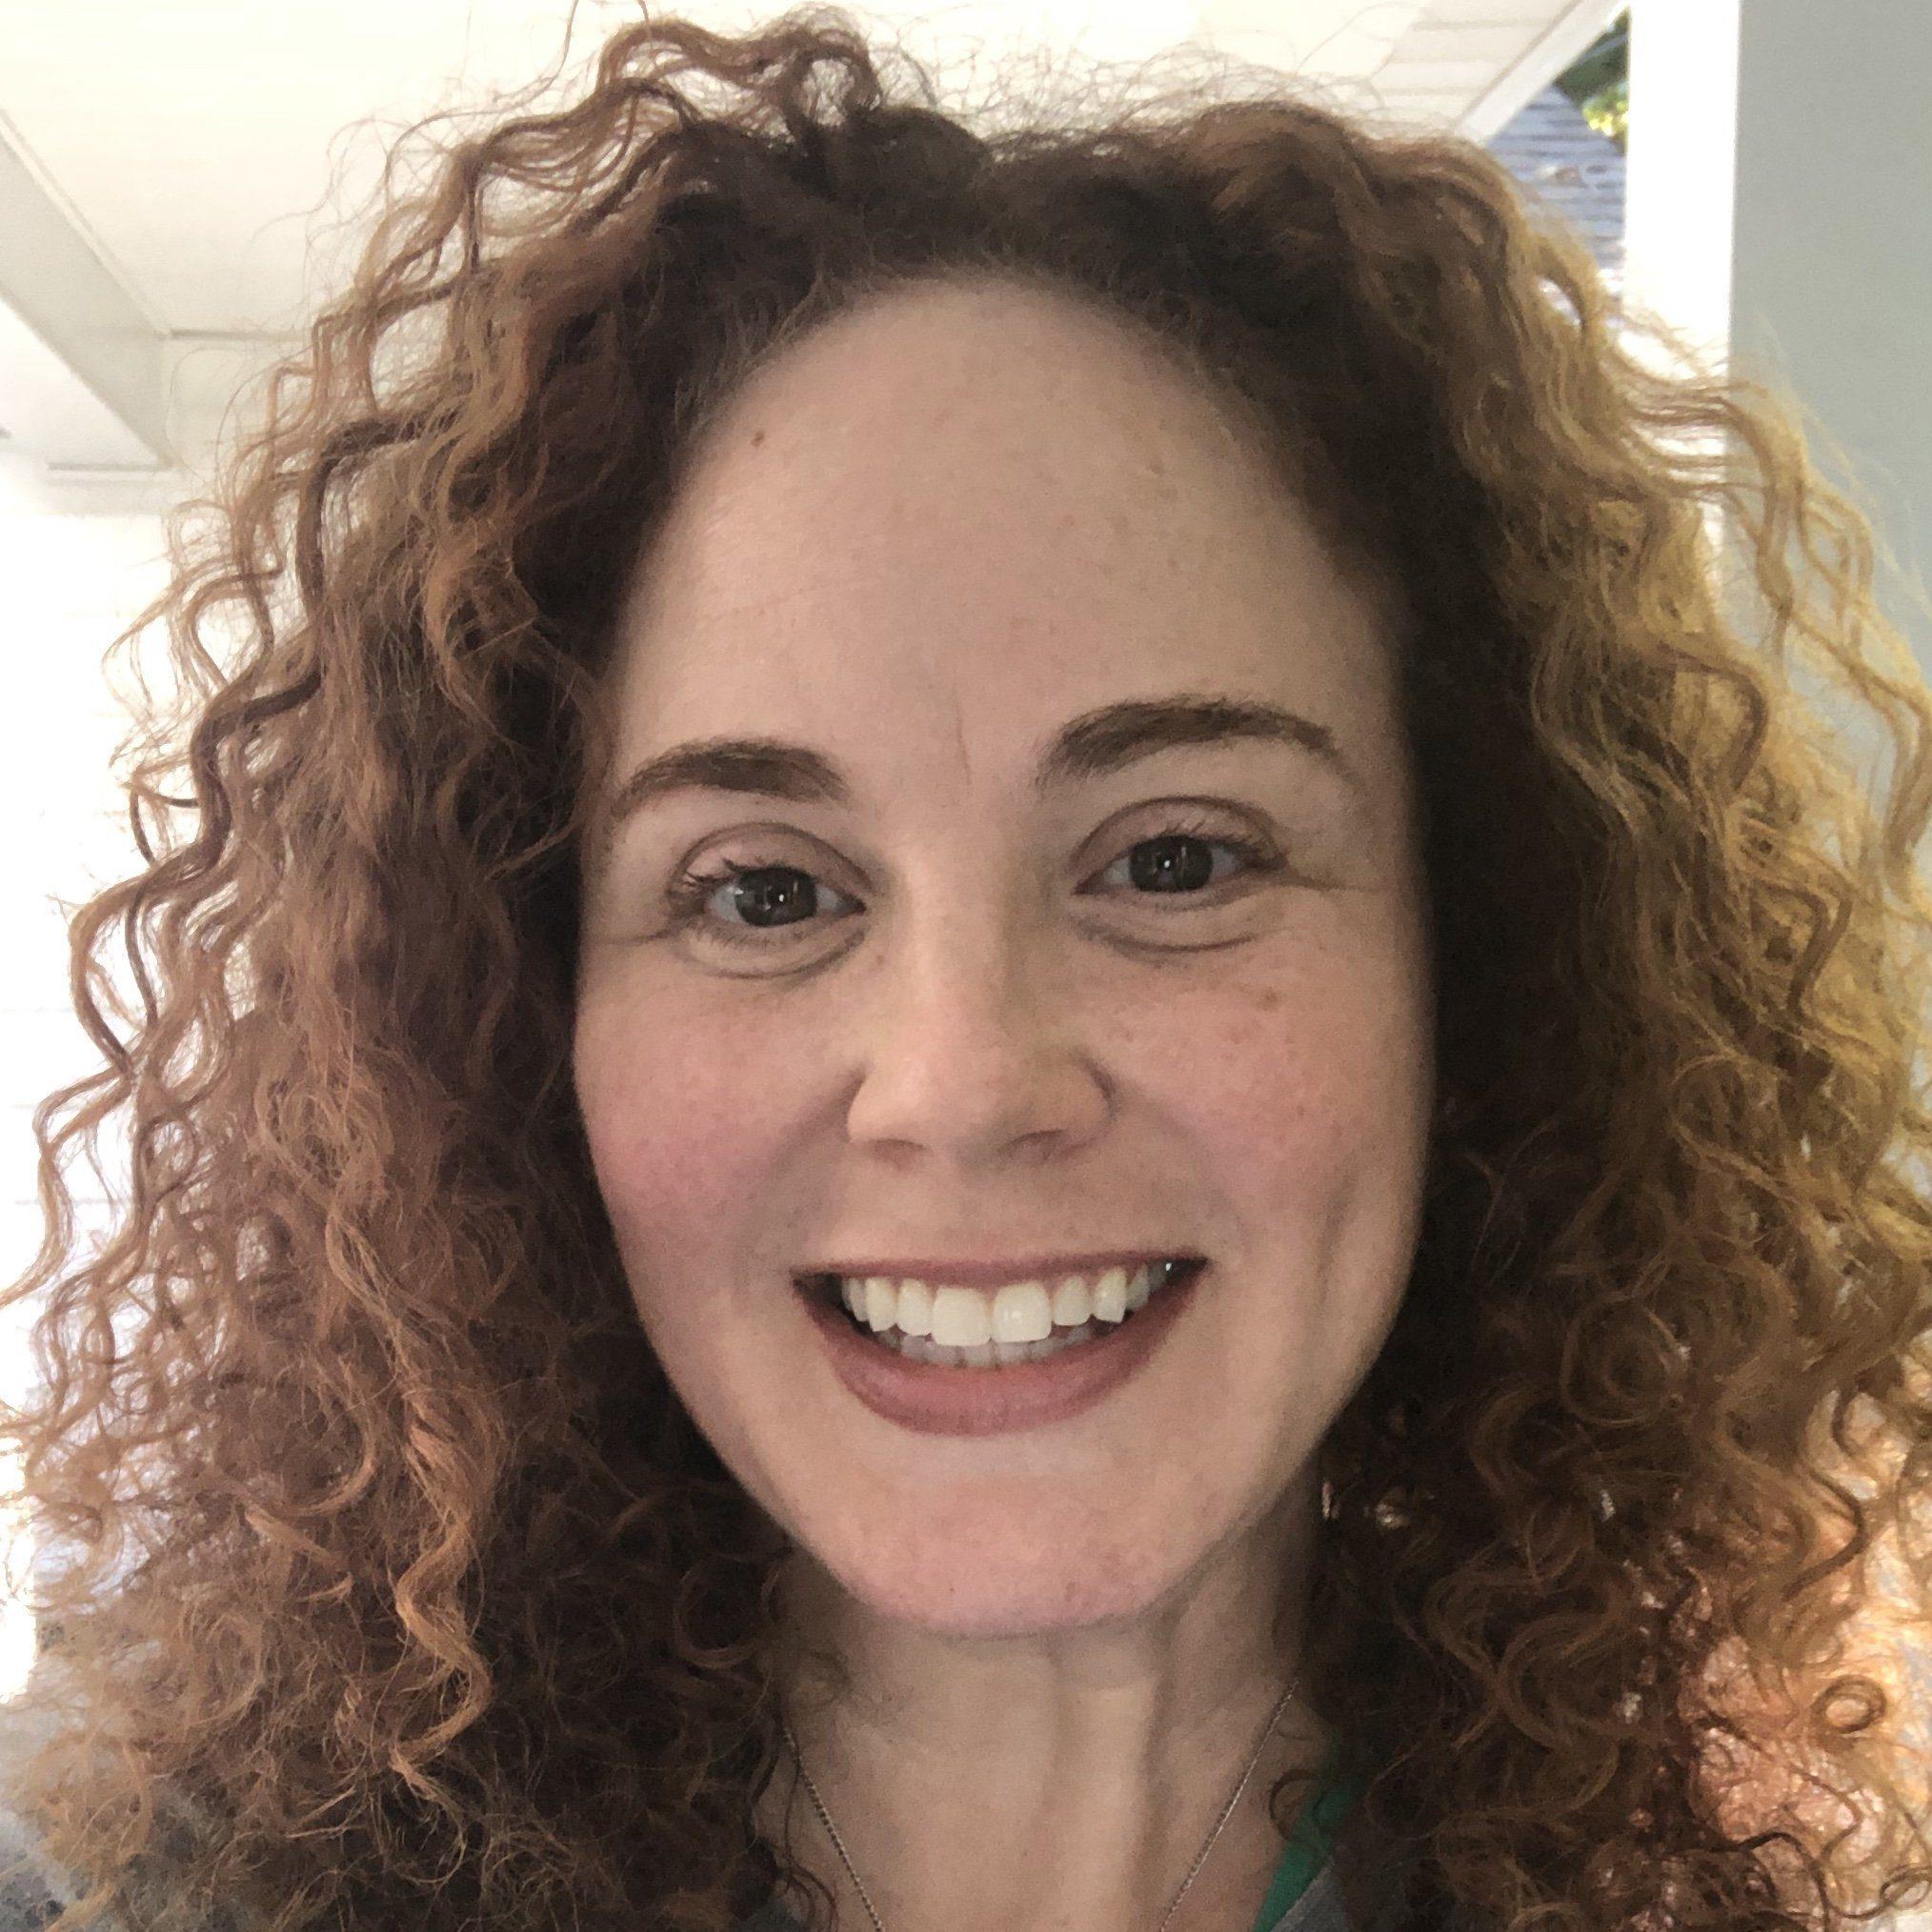 Michele Shusterman